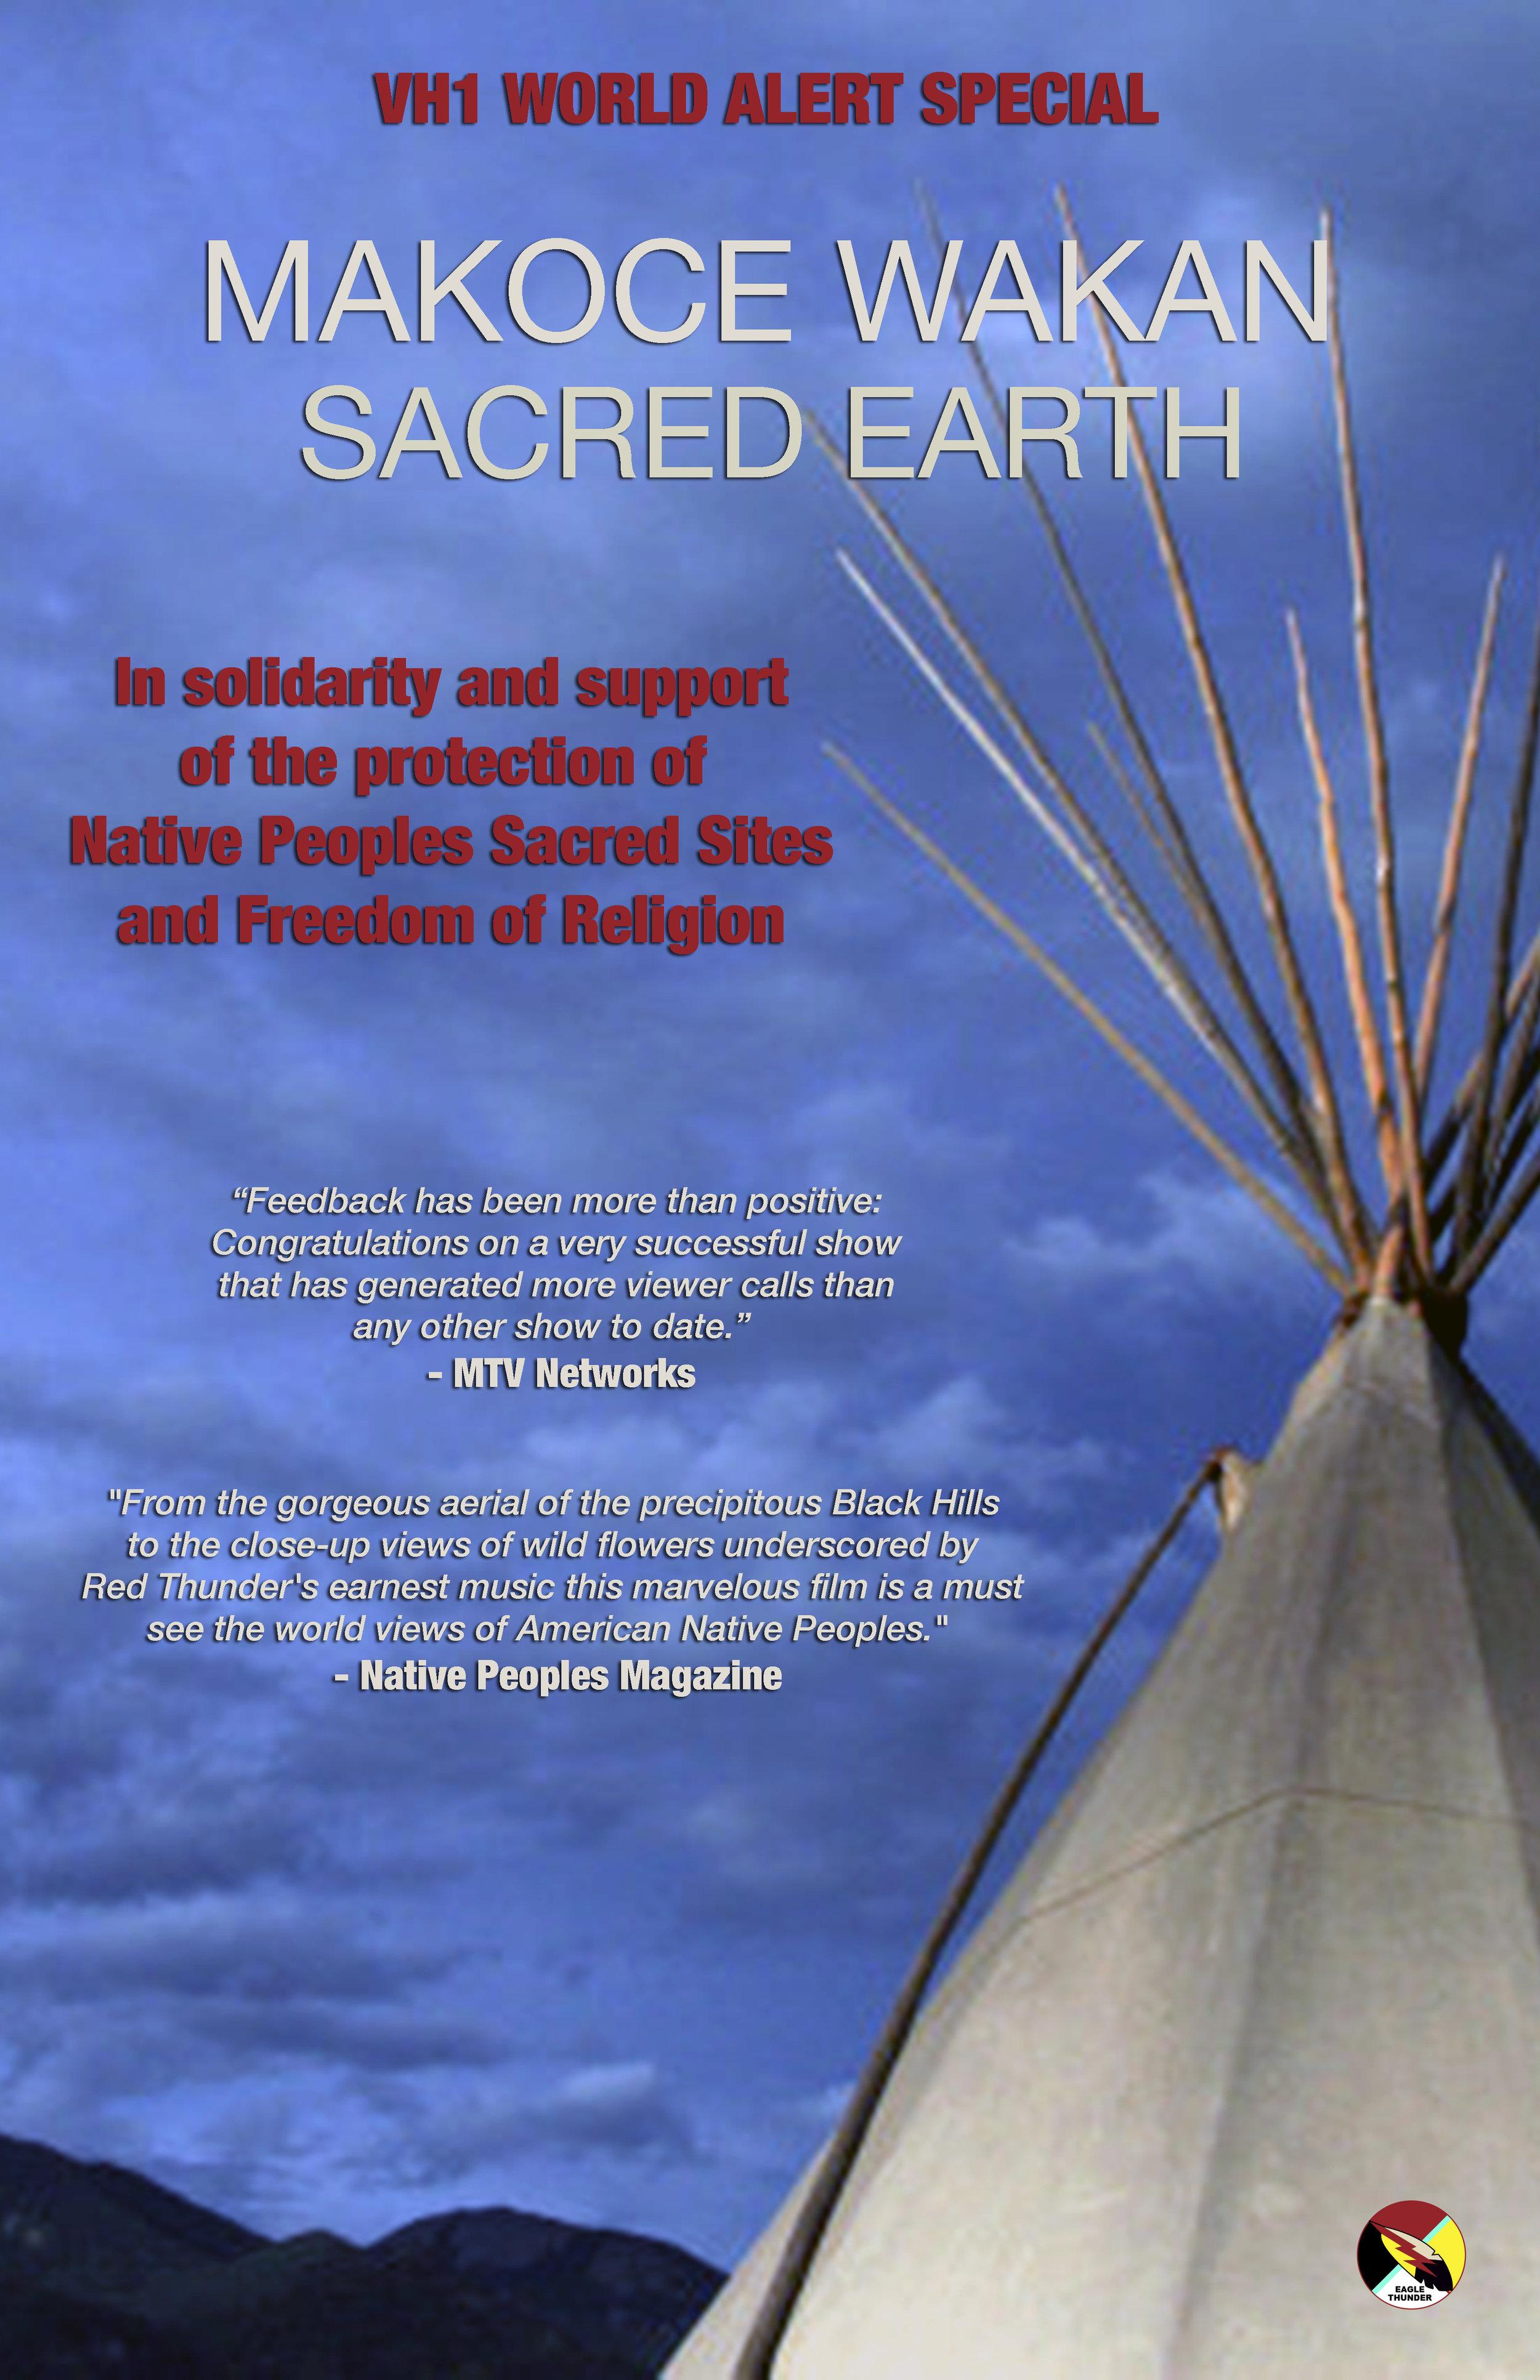 Makoce Wakan: Sacred Earth